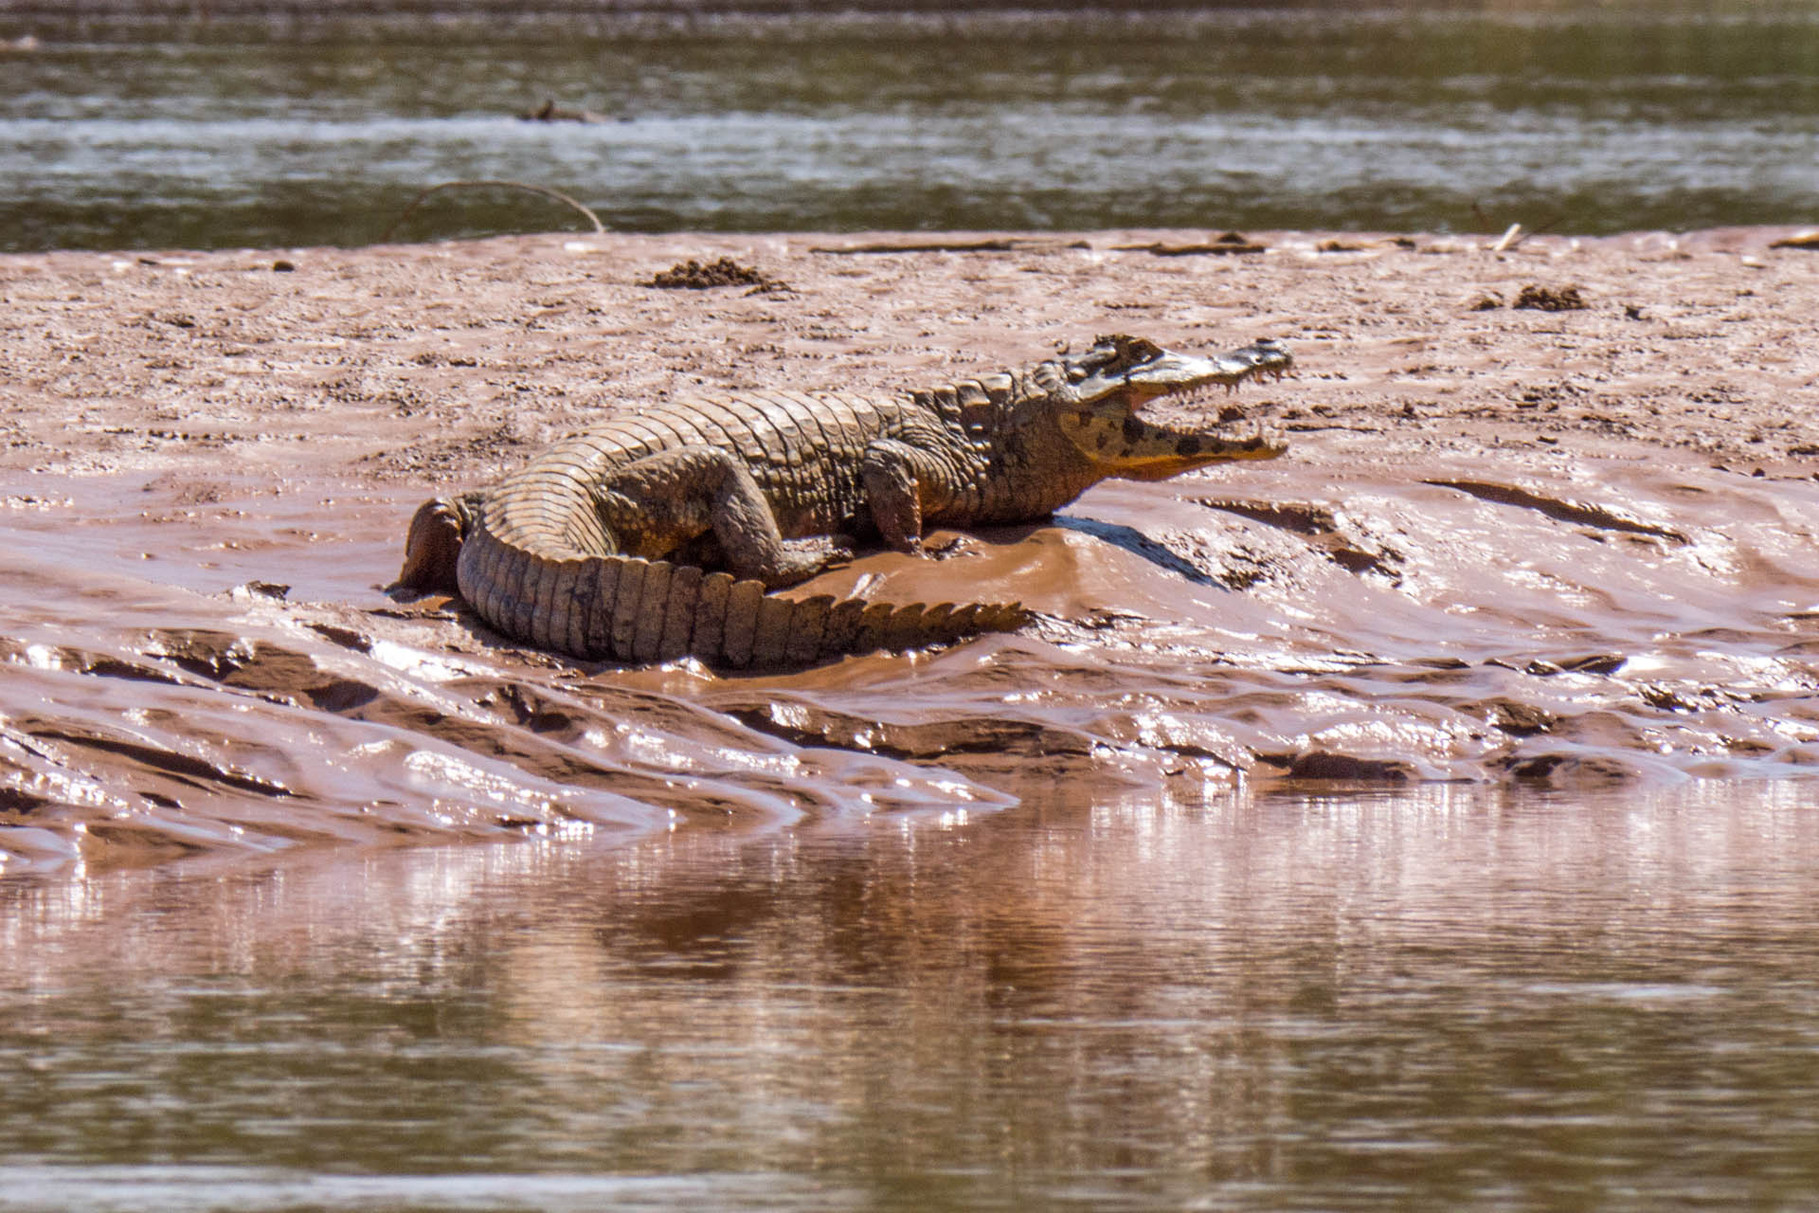 Caiman at the shore of Rio Tuichi, Madidi Nationalpark